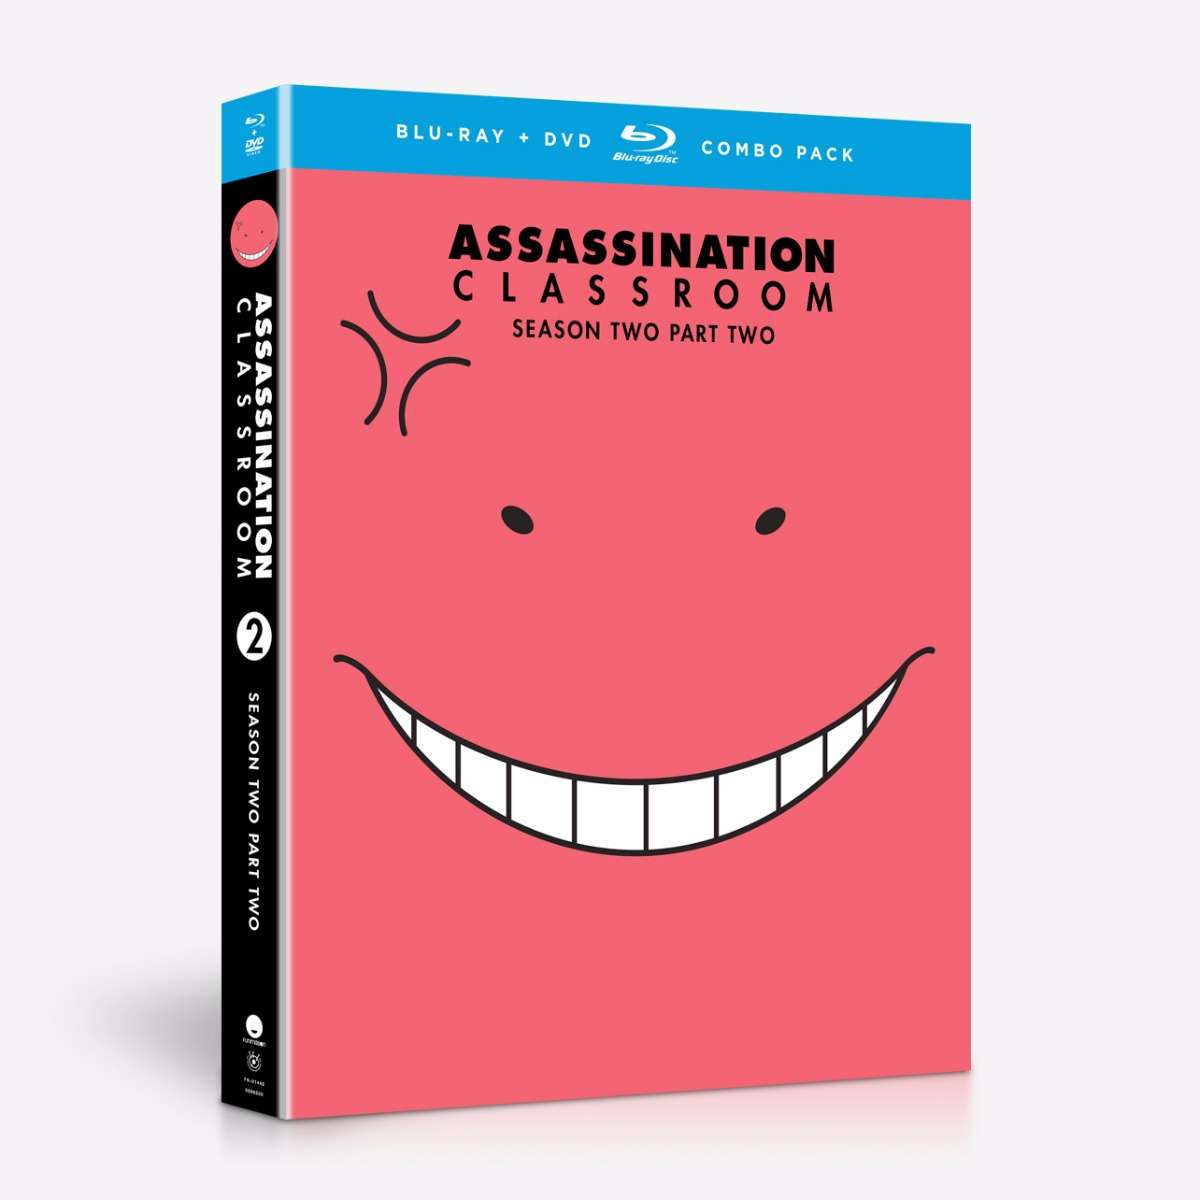 Assassination Classroom Season 2 Part 2 Blu-ray/DVD 704400014482